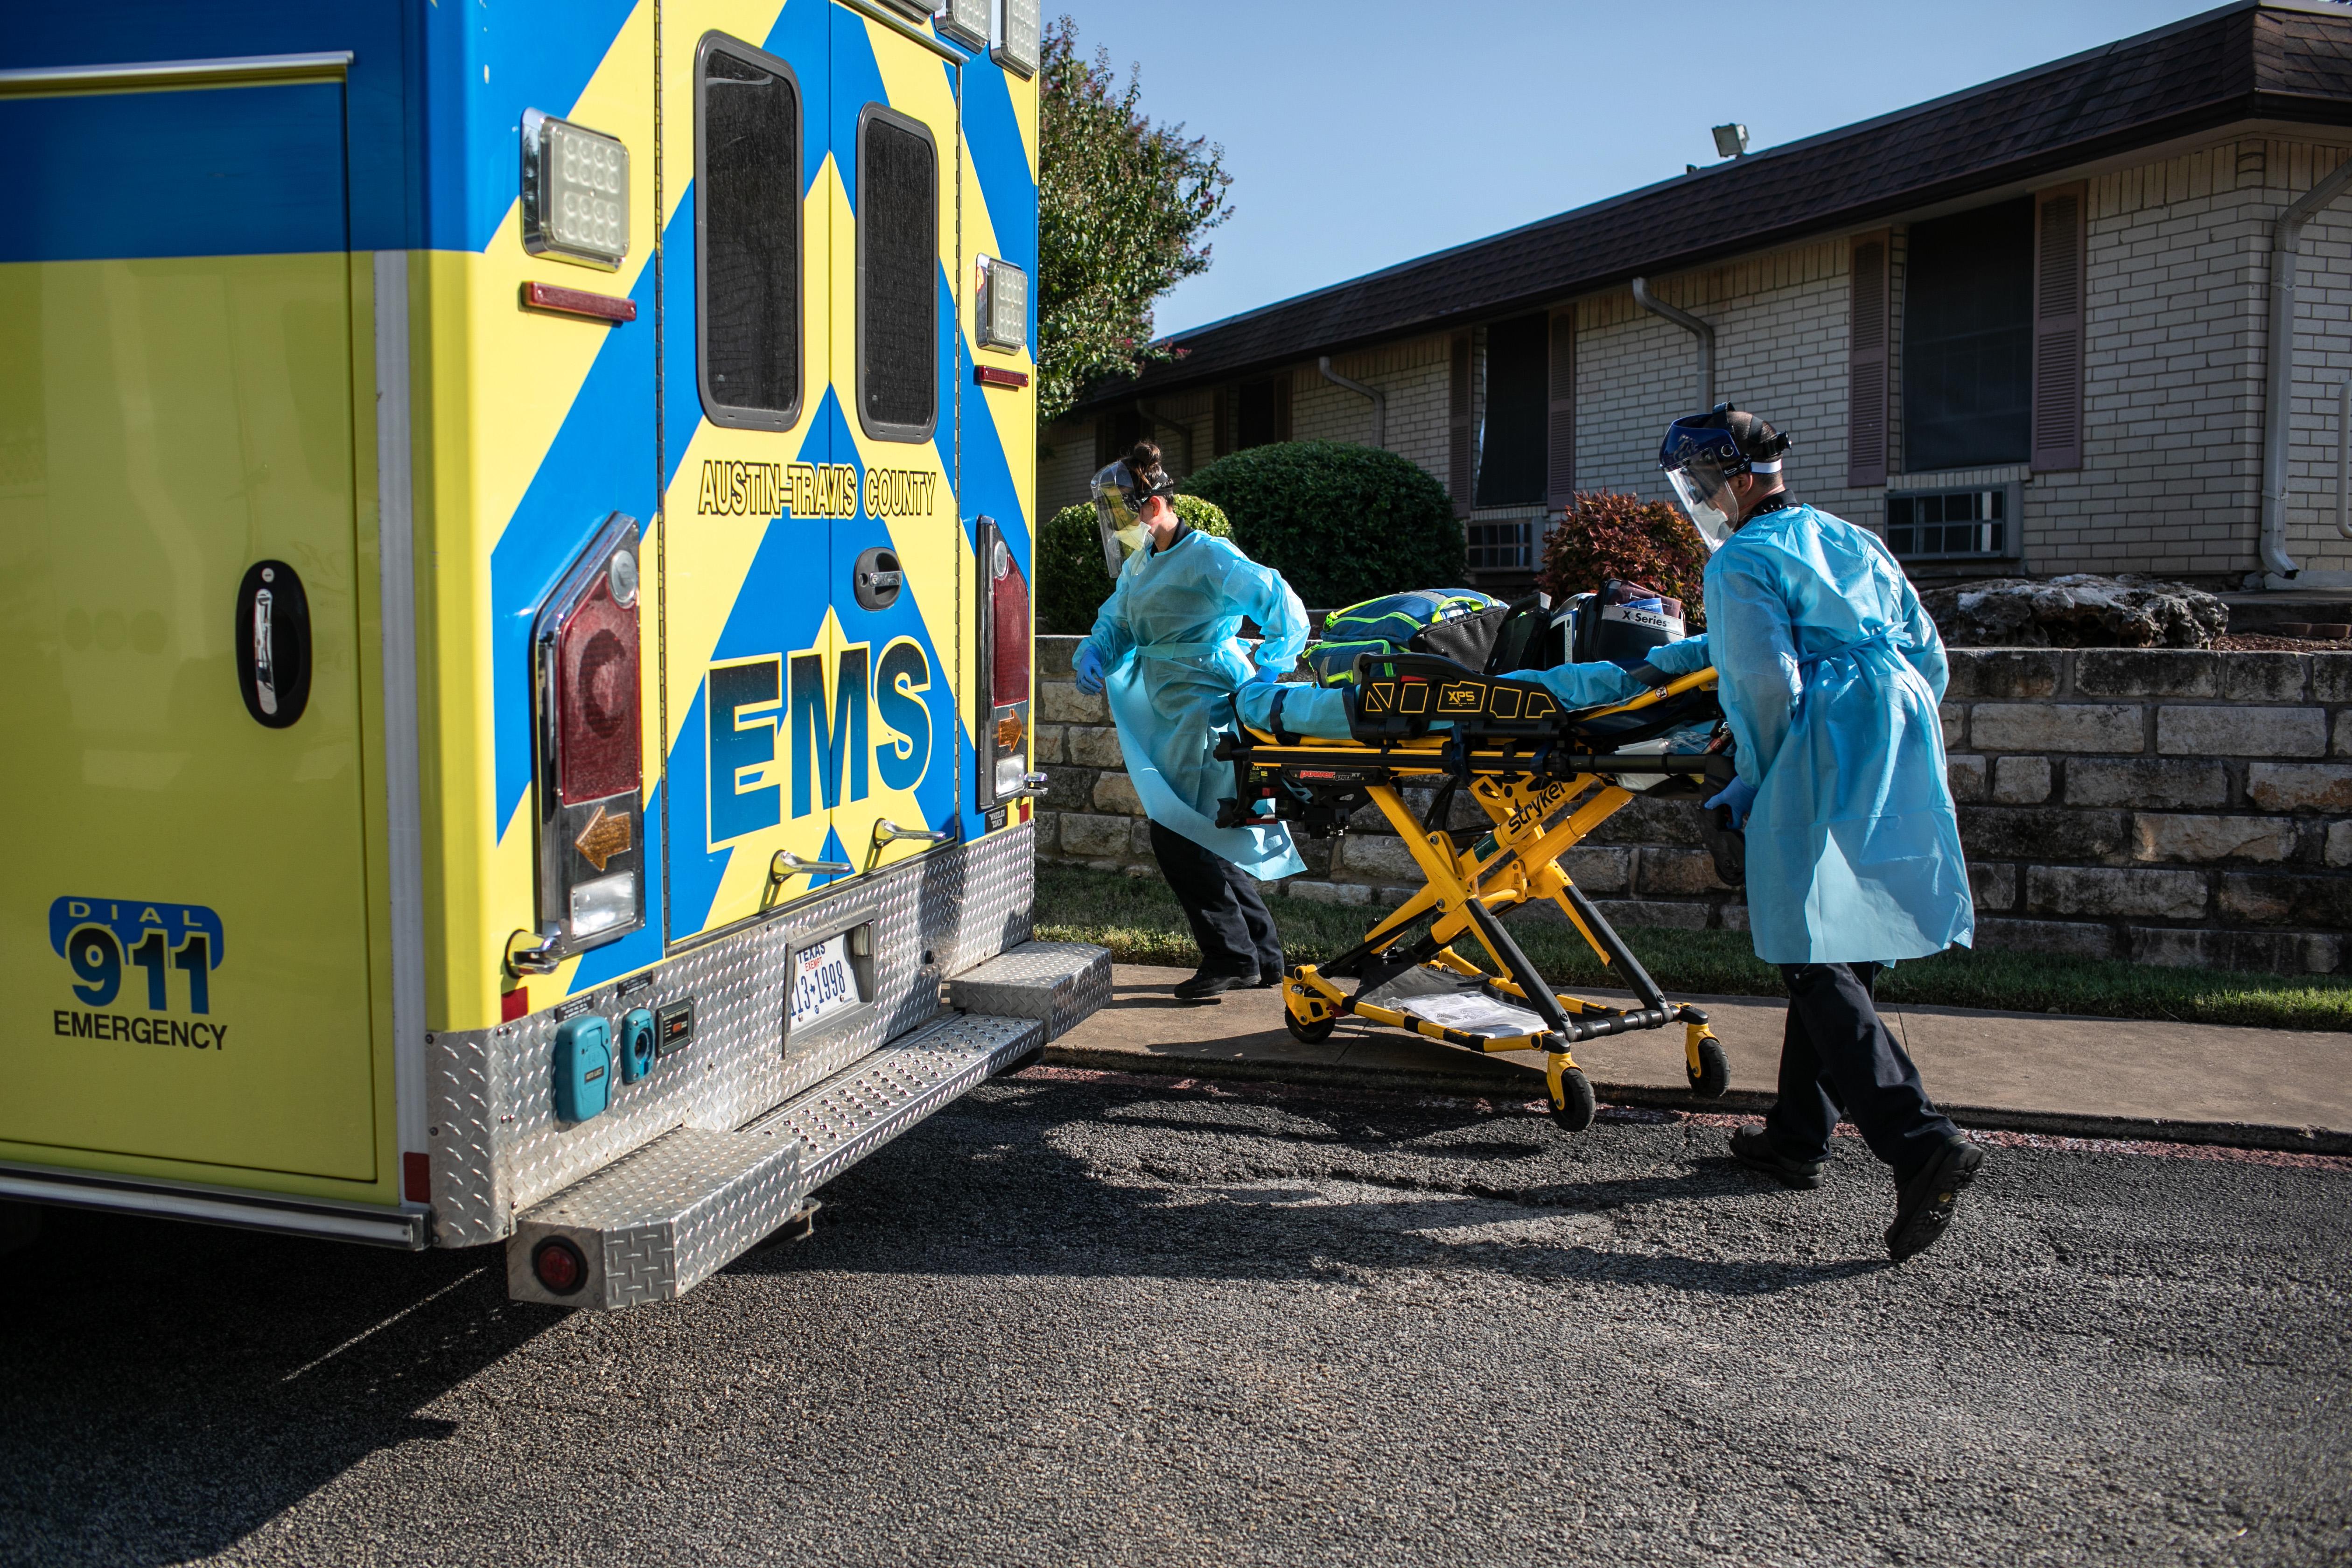 Austin-Travis County medics prepare to enter a nursing home on August 5 in Austin, Texas.